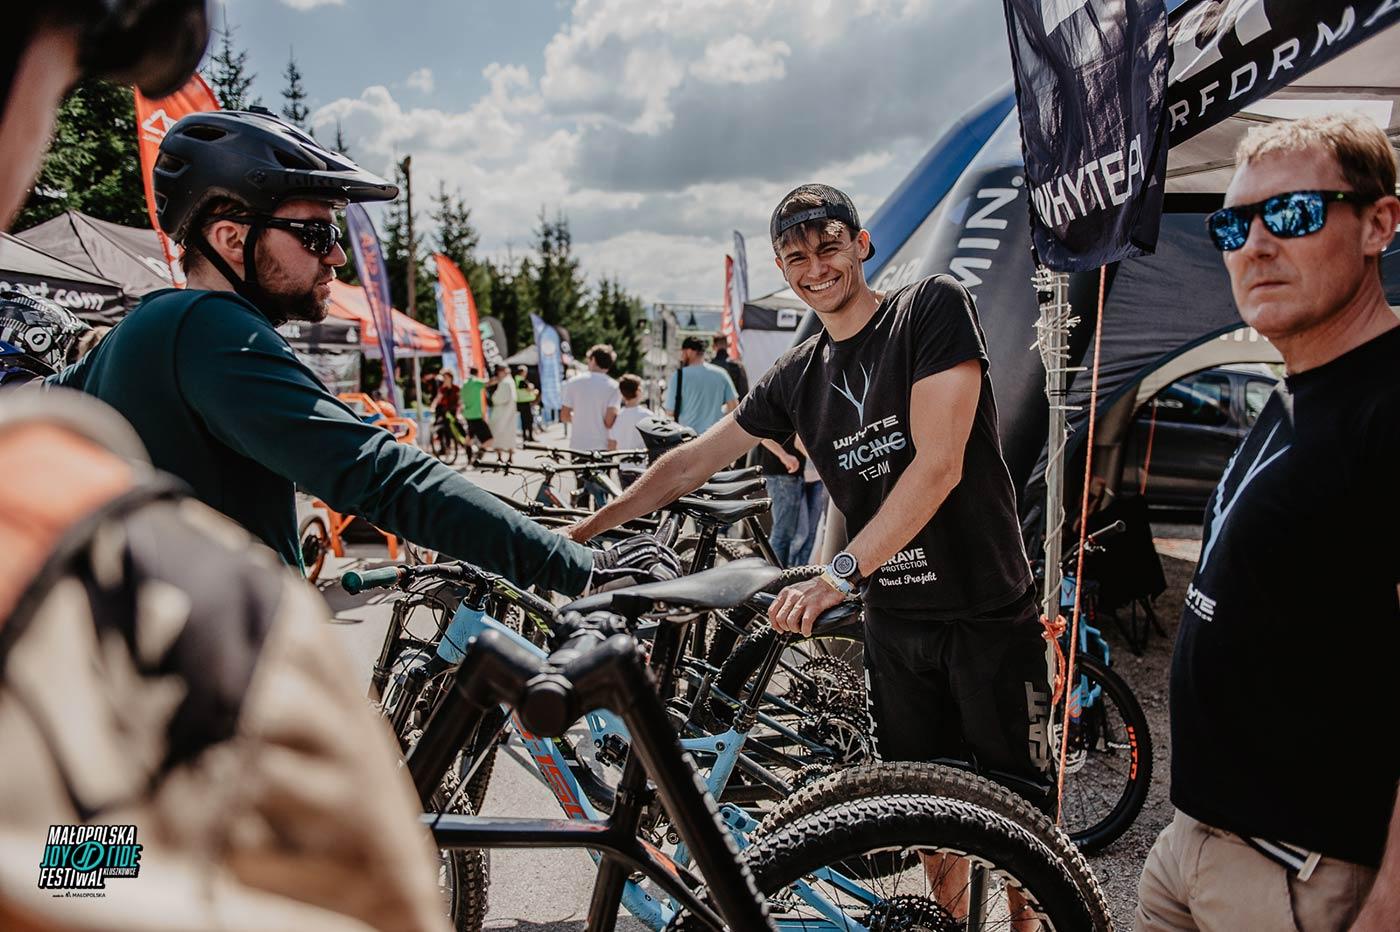 Małopolska Joy Ride Festiwal 2021 2